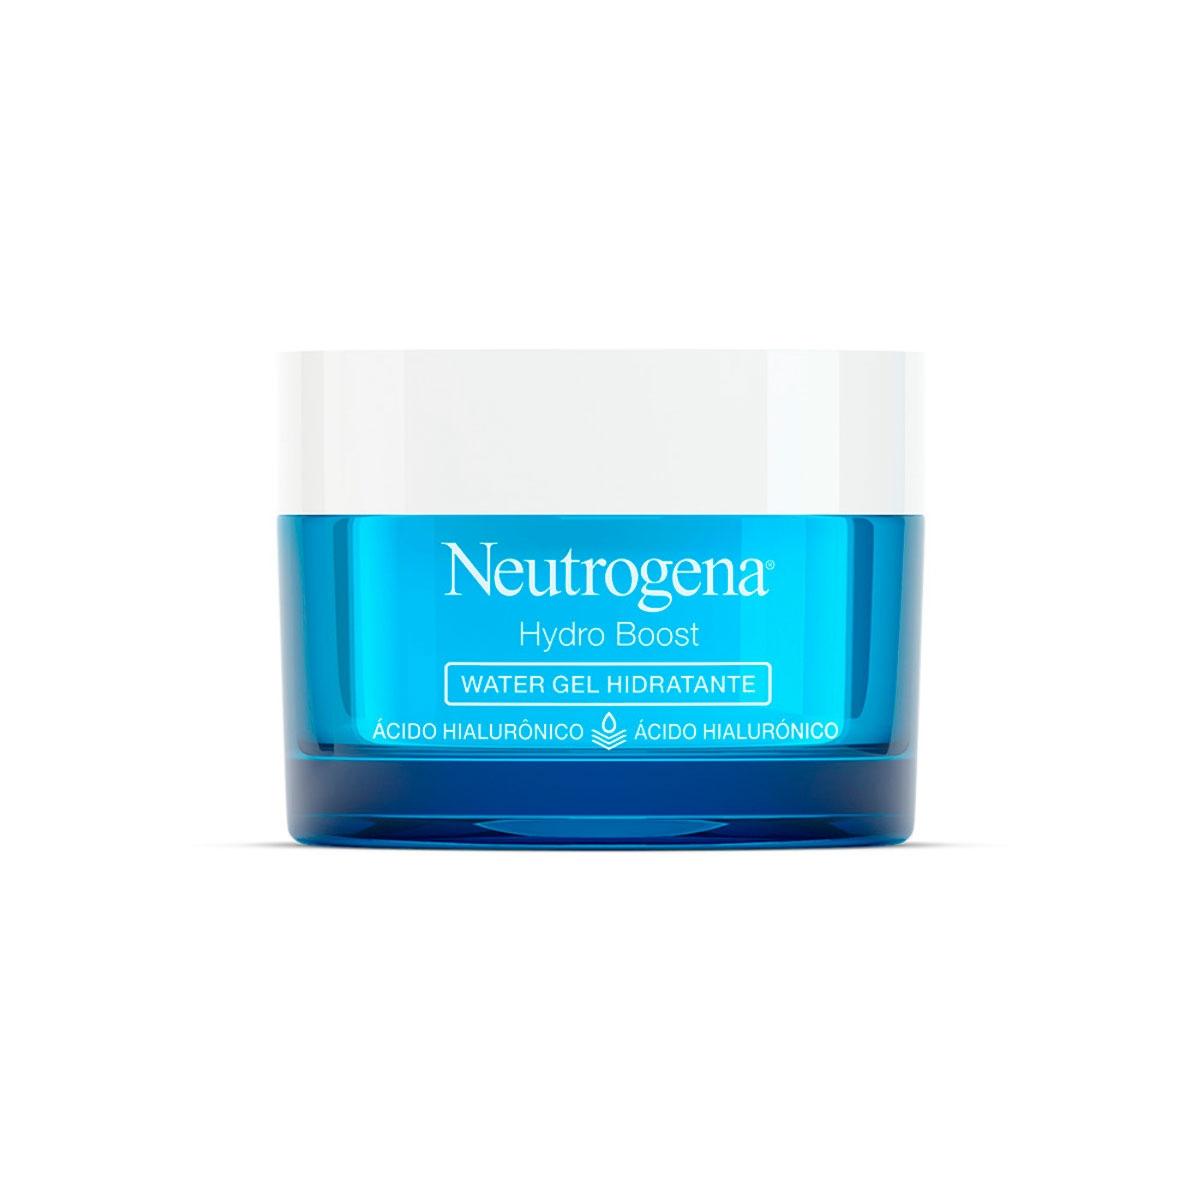 Neutrogena Hydro Boost Water Gel Hidratante Facial com 50g 50g